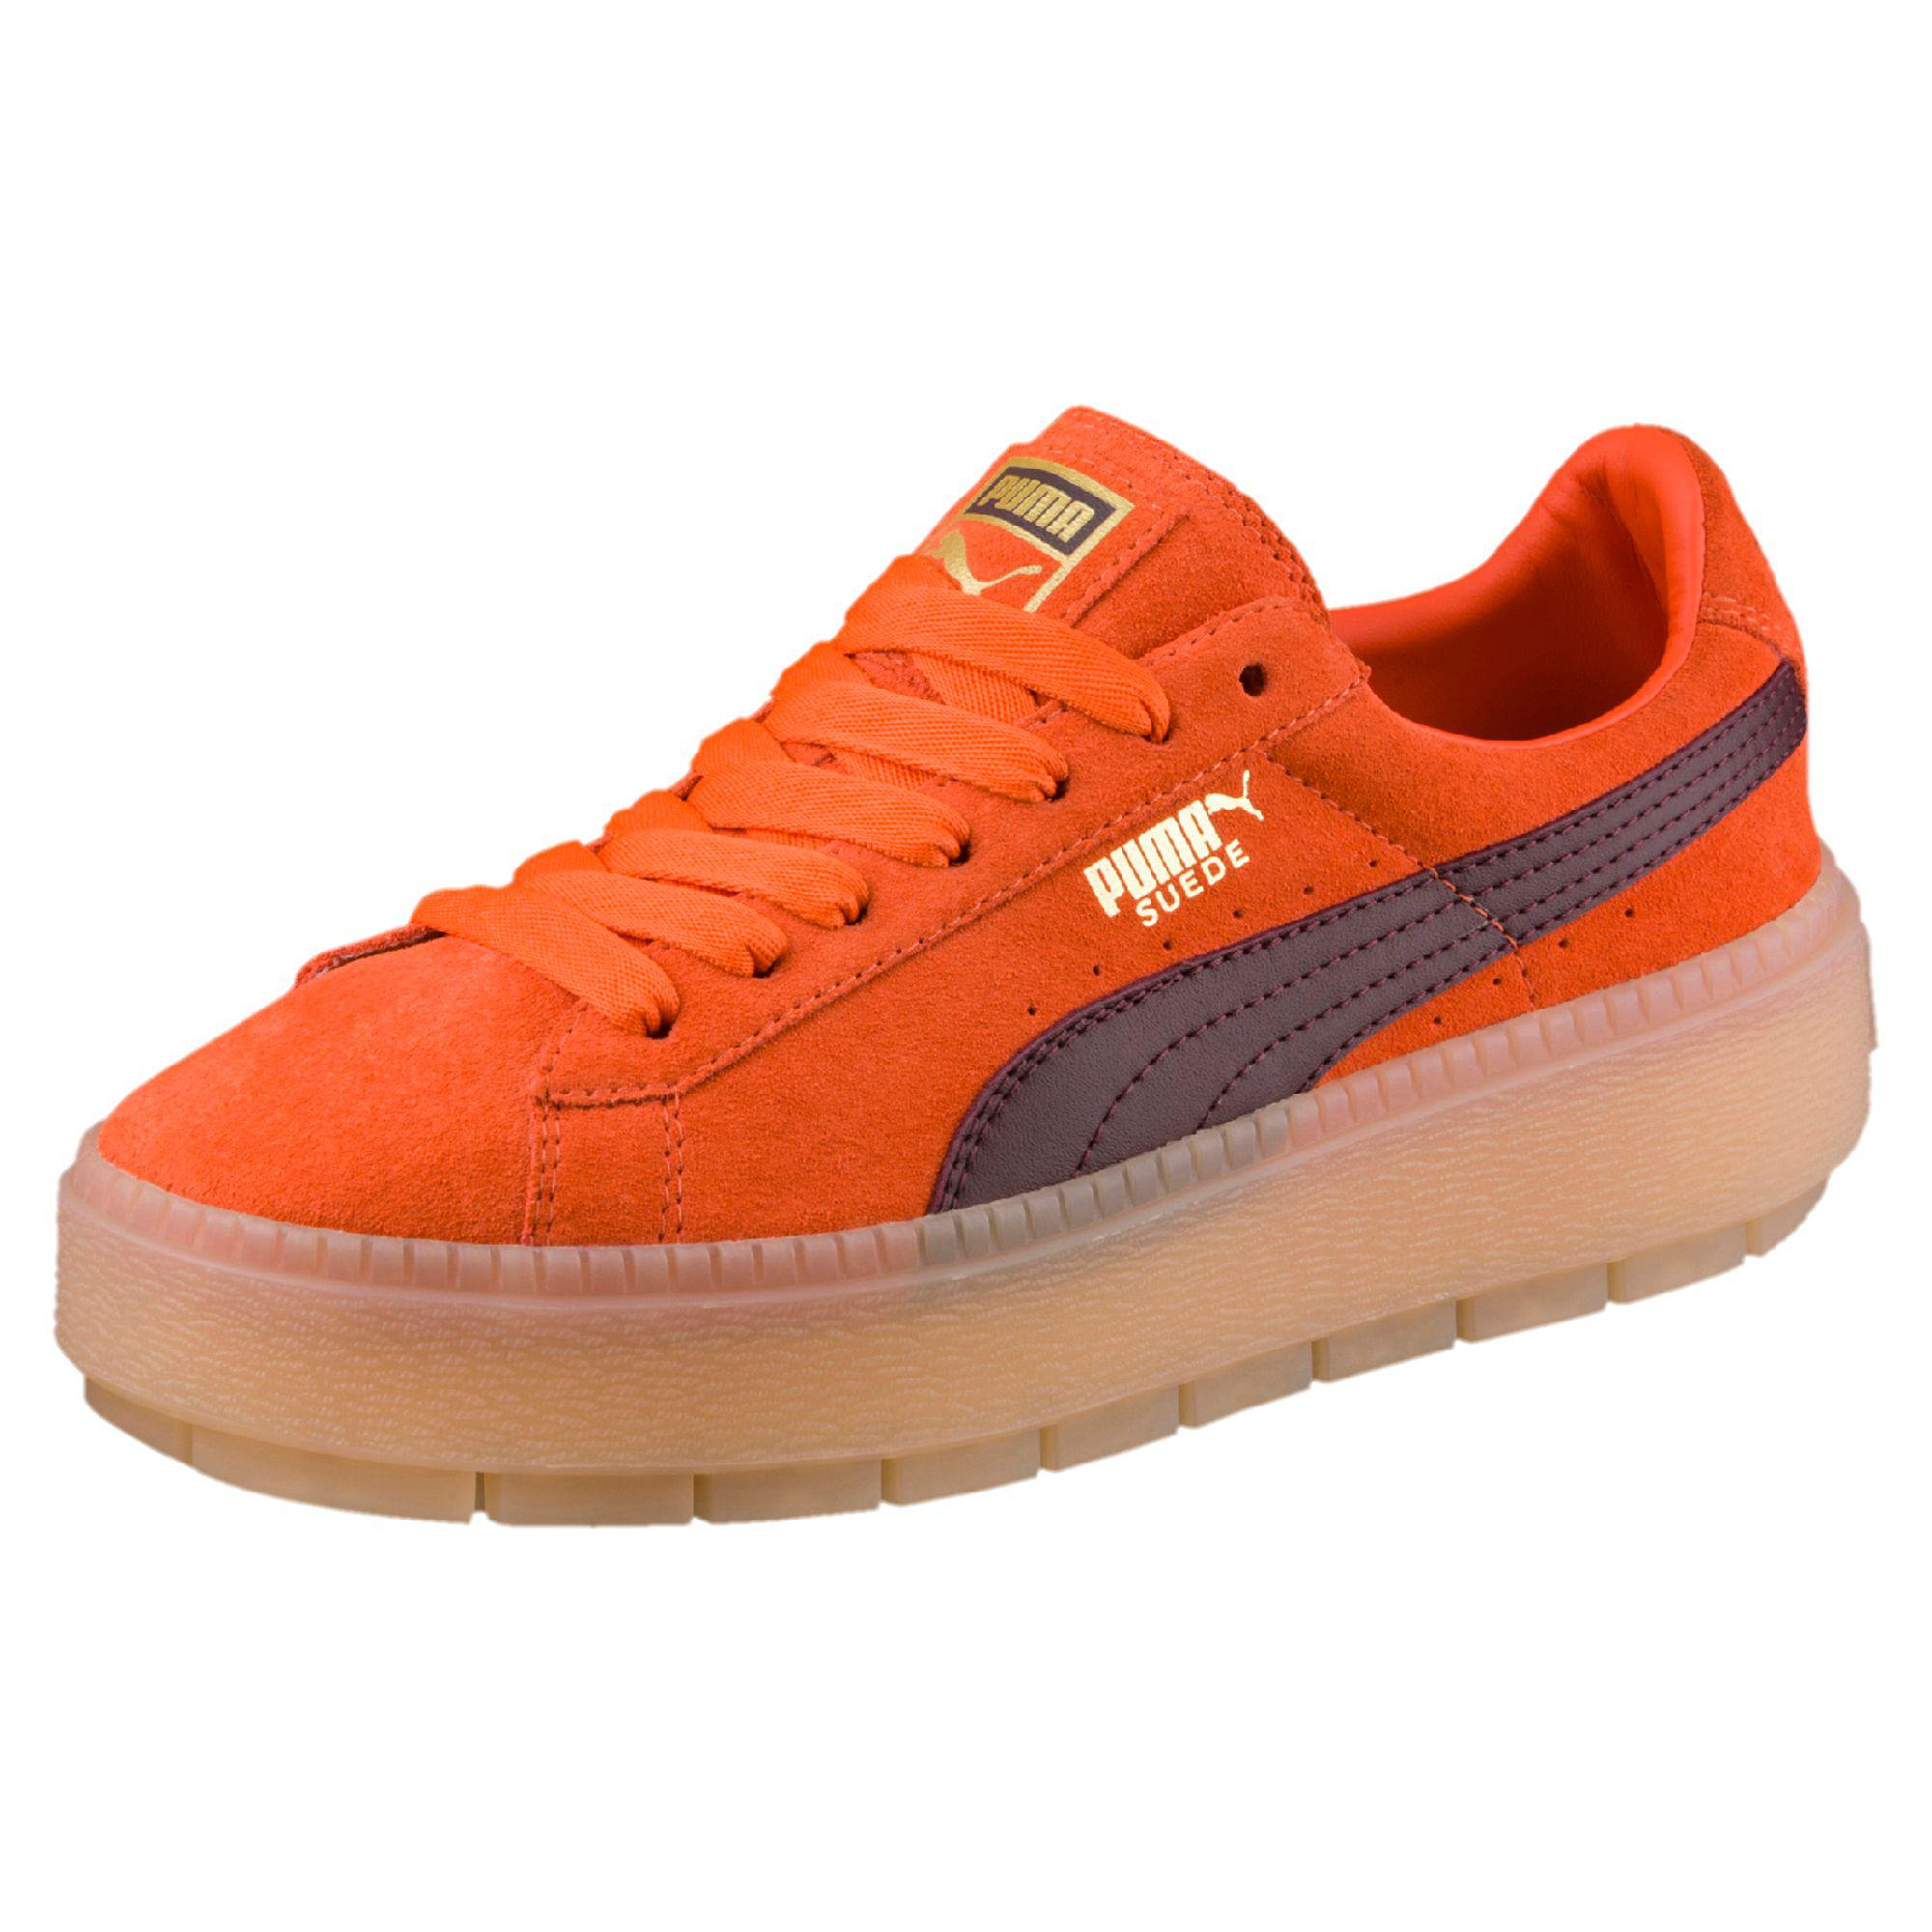 puma suede platform orange